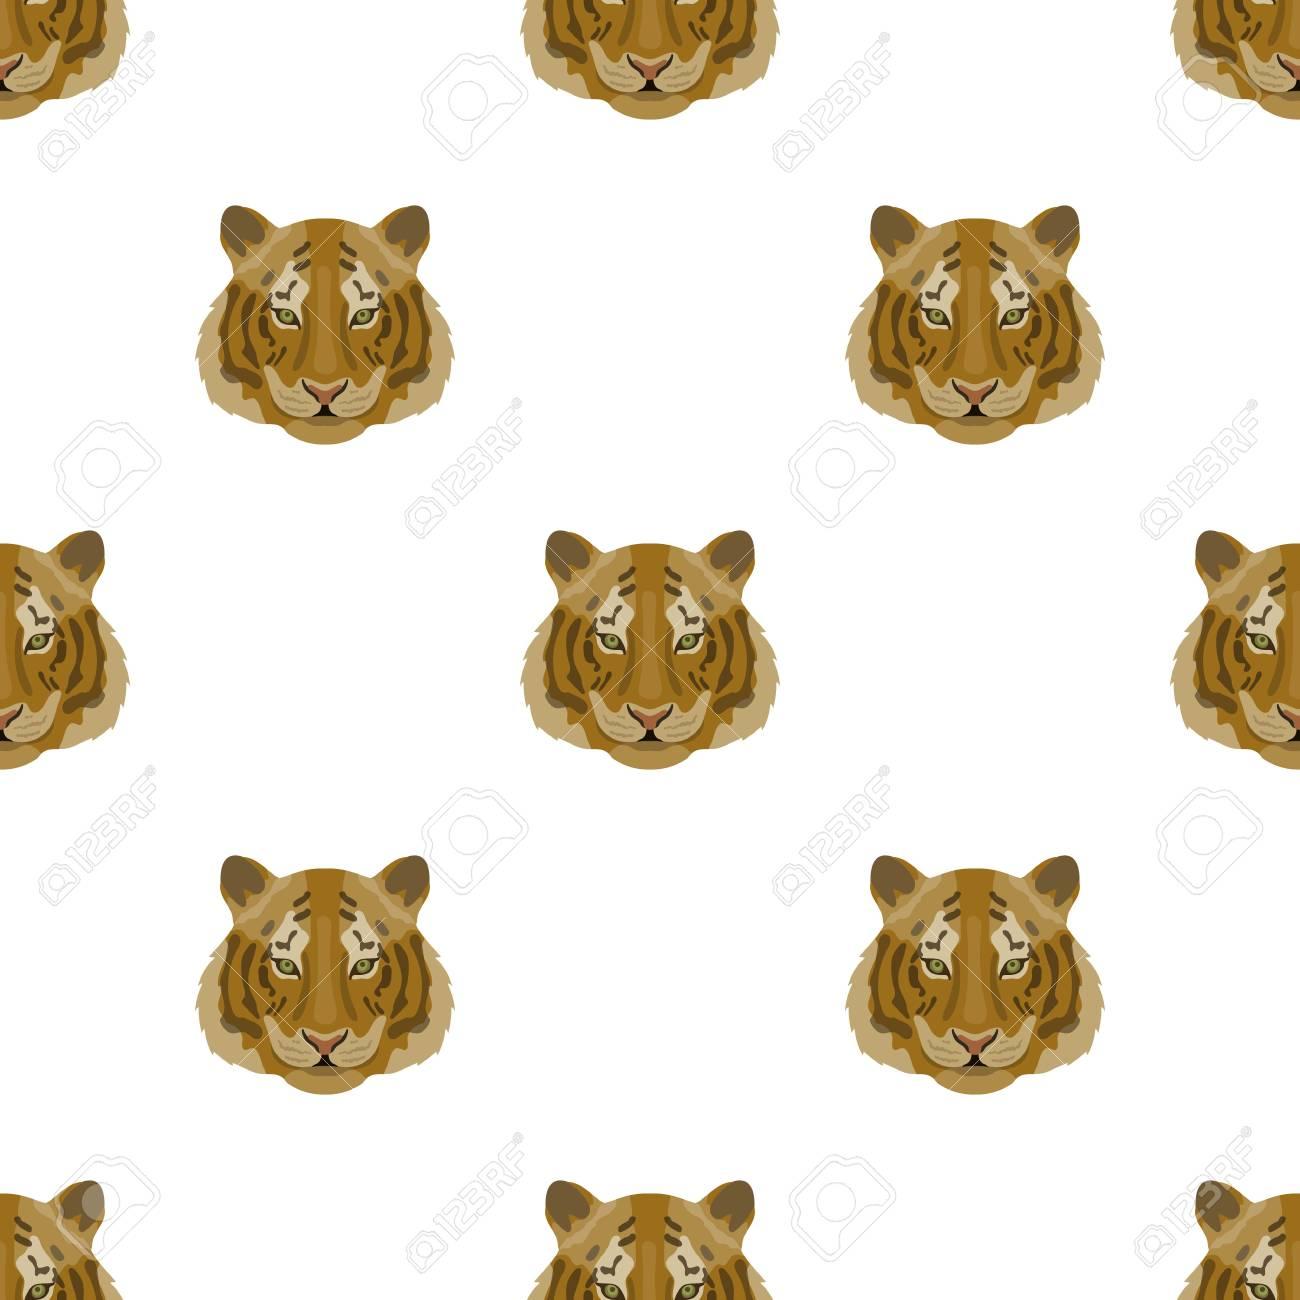 Icone De Tigre En Dessin Anime Isole Sur Fond Blanc Animaux